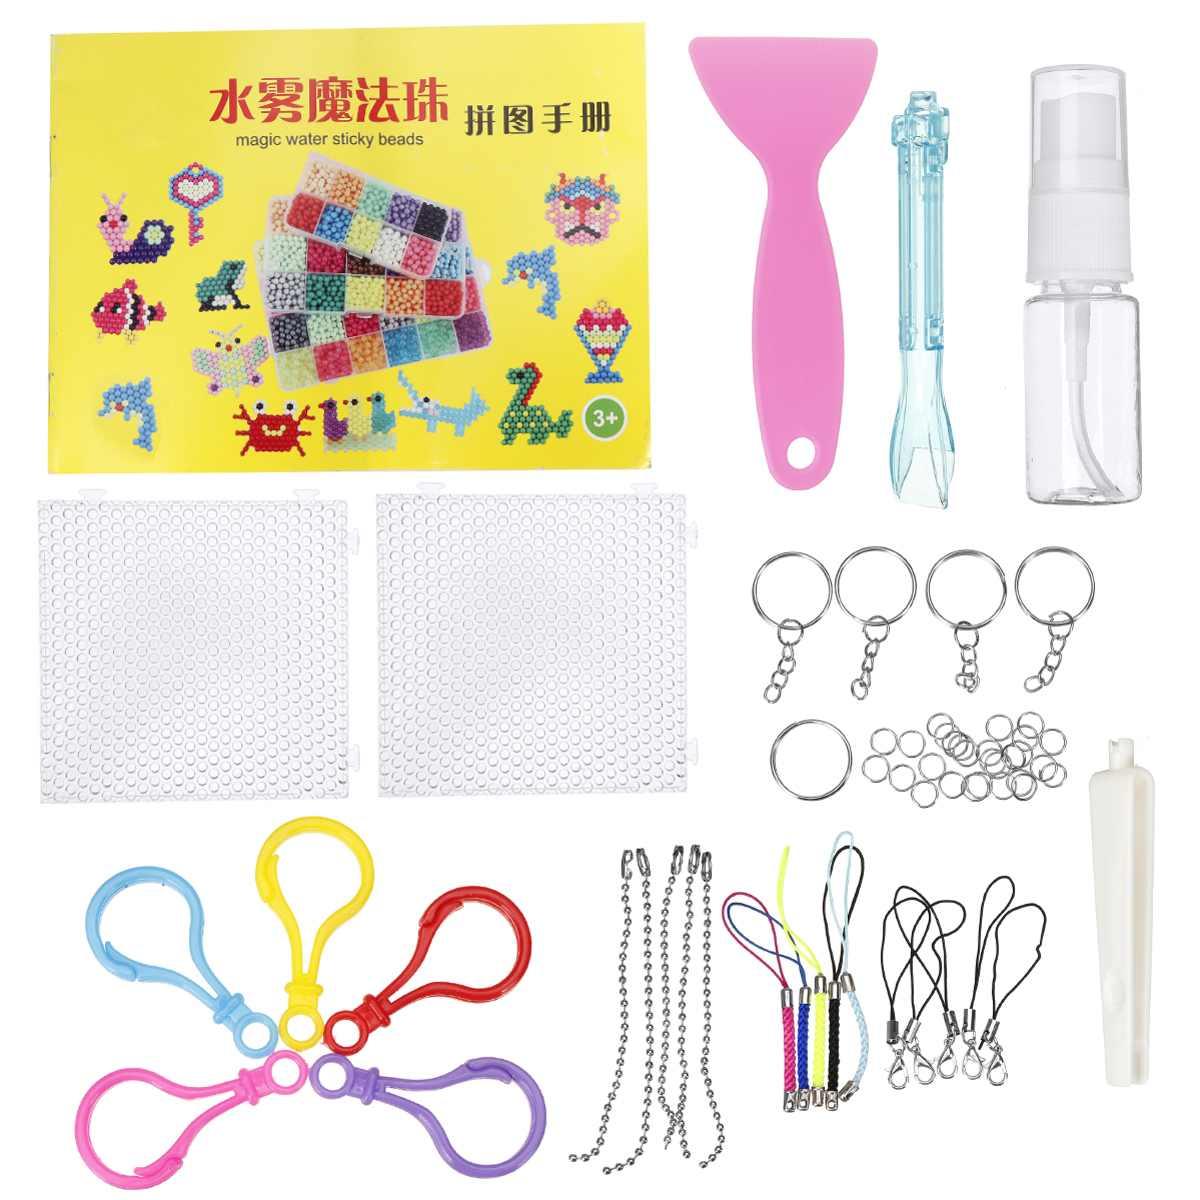 1100Pcs Aqua Refill Fuse Water Bead Sticky Pegboard DIY Craft Art Kids Toy Gift